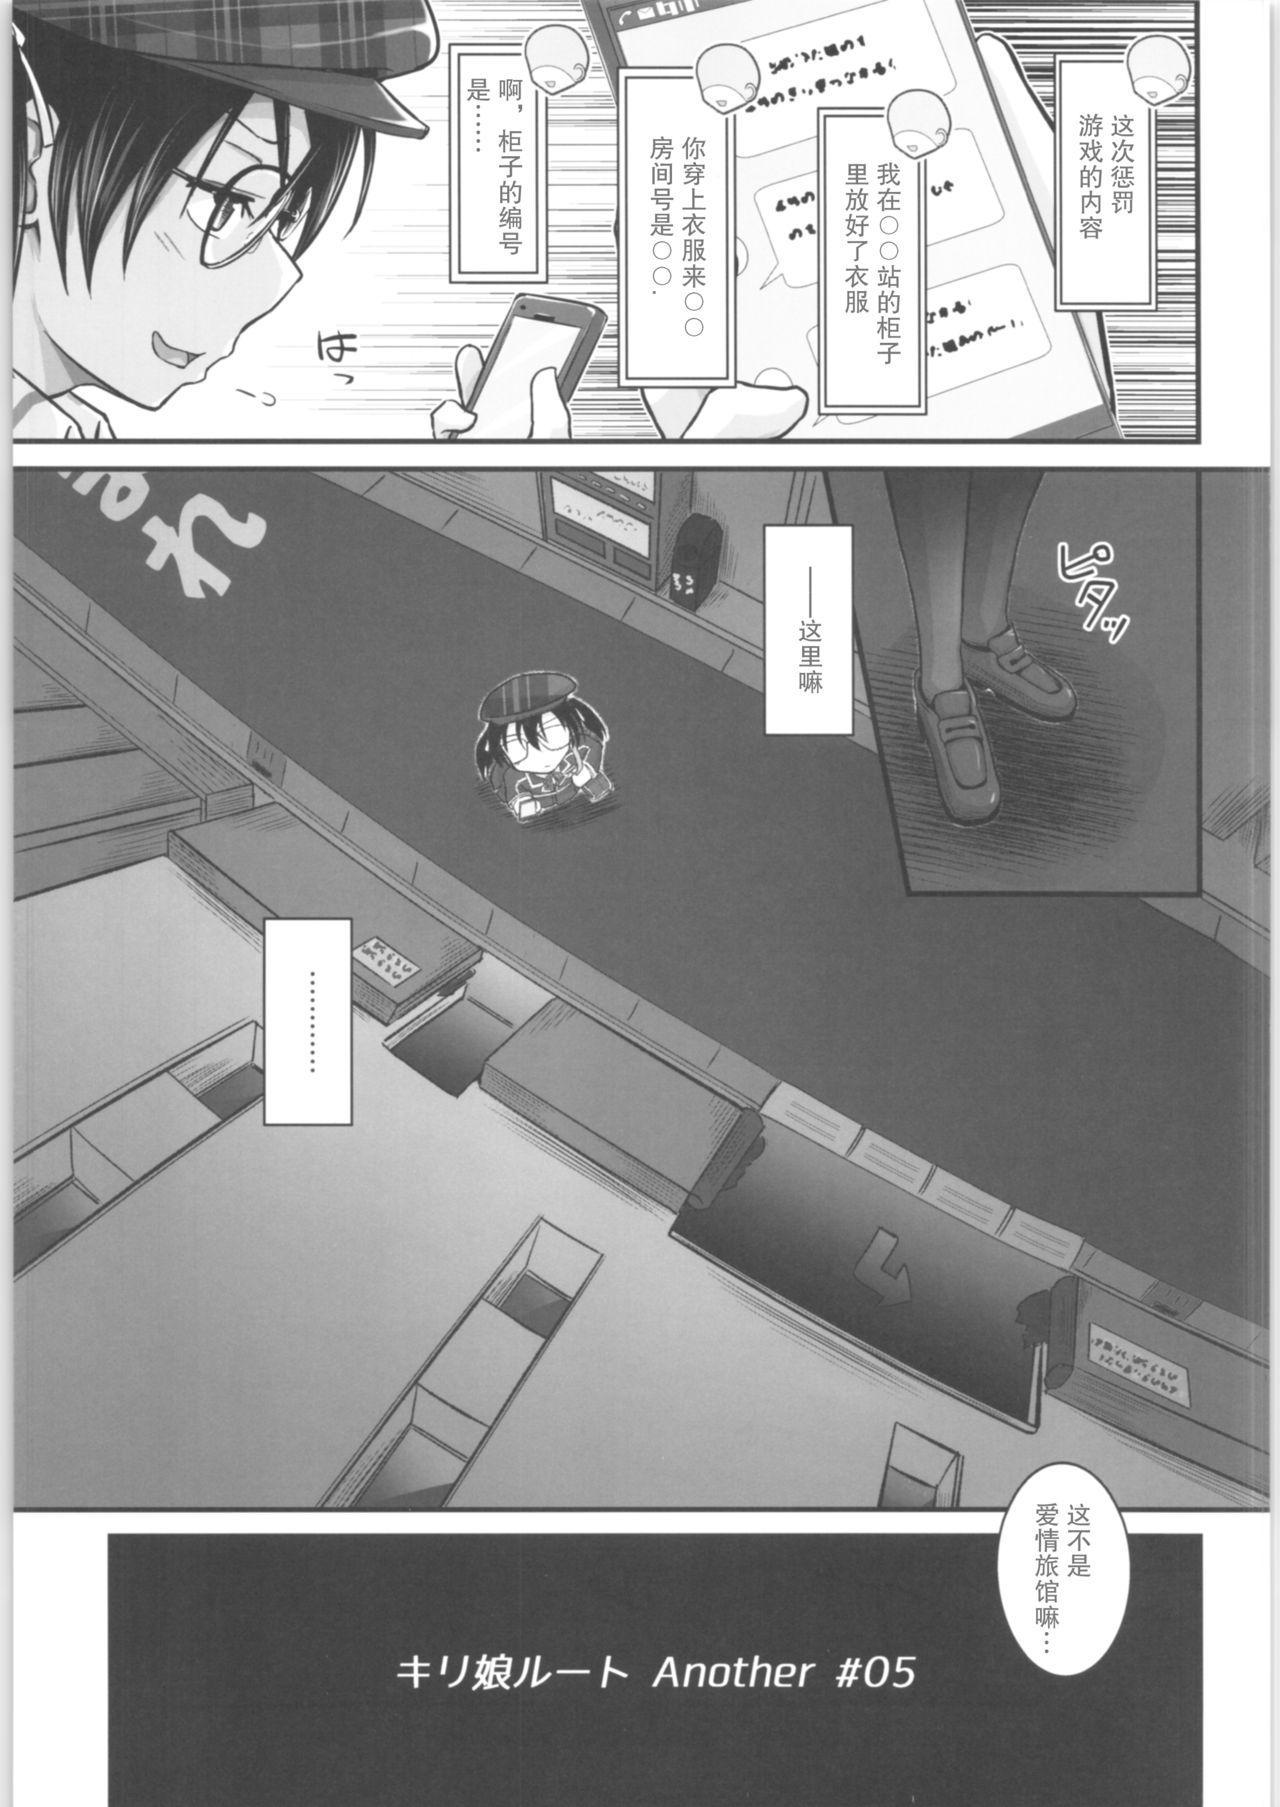 [Umari-ya (D-2)] Kiriko Route Another #05 ~Seifuku Josou Anal Junchi Hen~ (Sword Art Online) ) [Chinese] [不可视汉化] 4